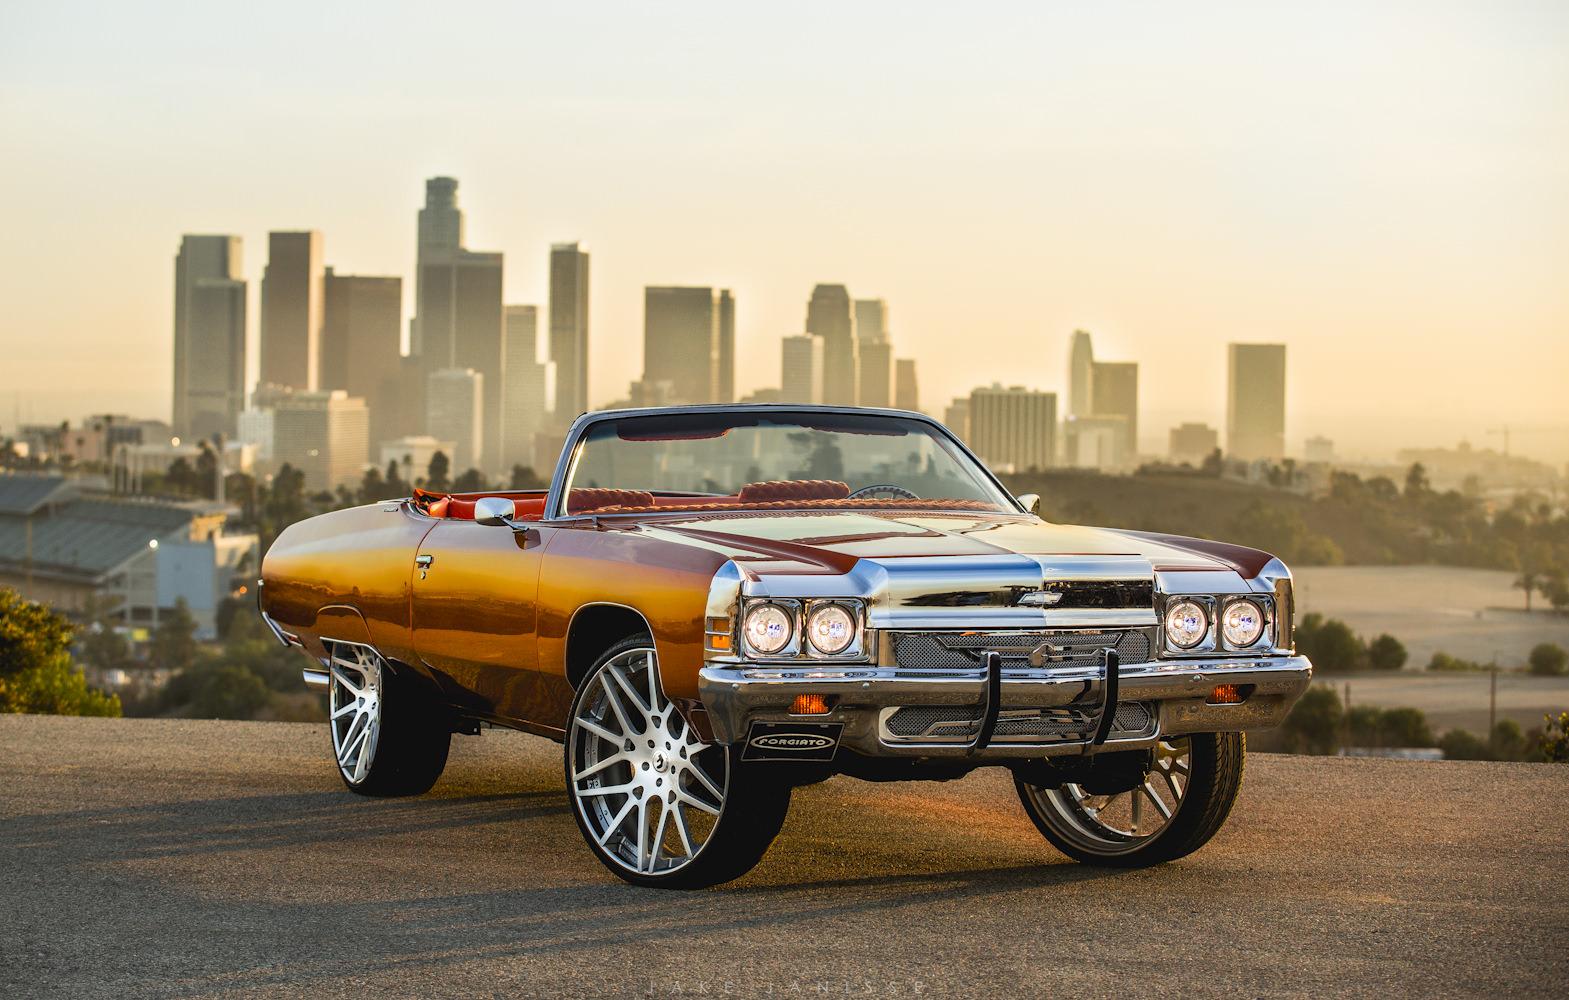 "Tyga's Chevy Impala On 28"" Forgiato's - Big Rims - Custom Wheels"